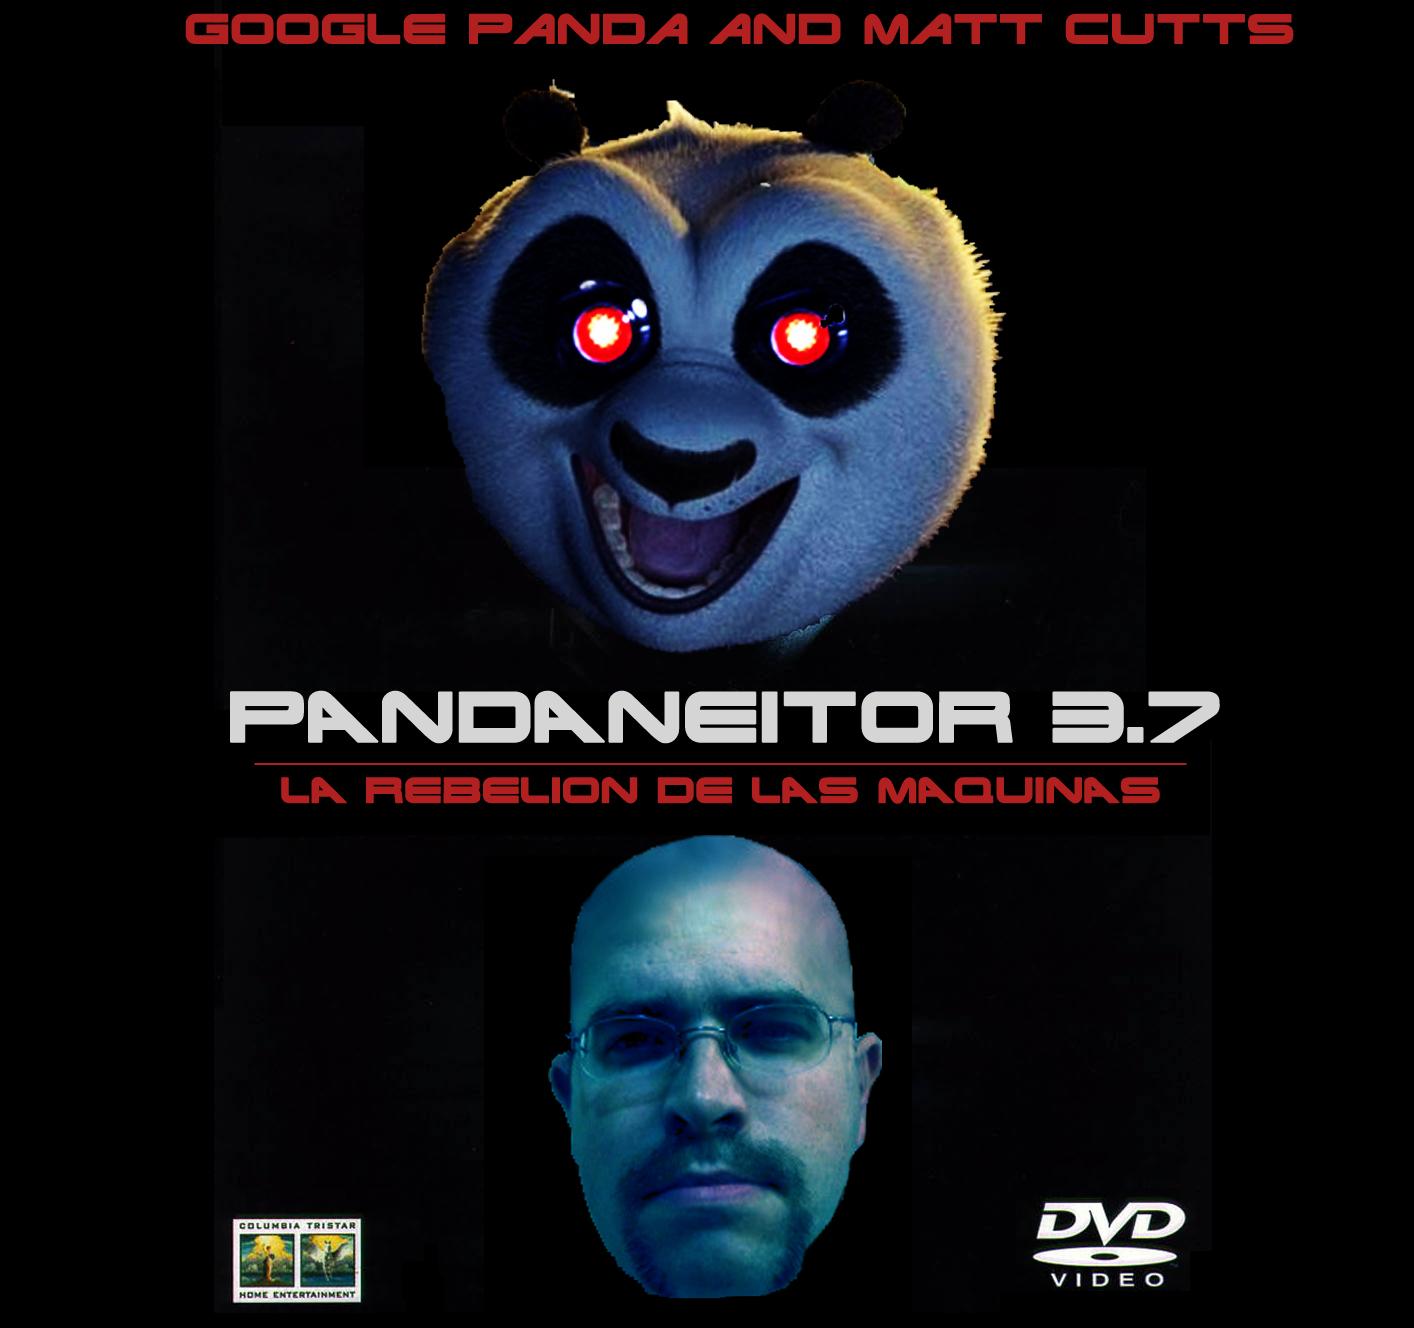 Pandaneitor3.7